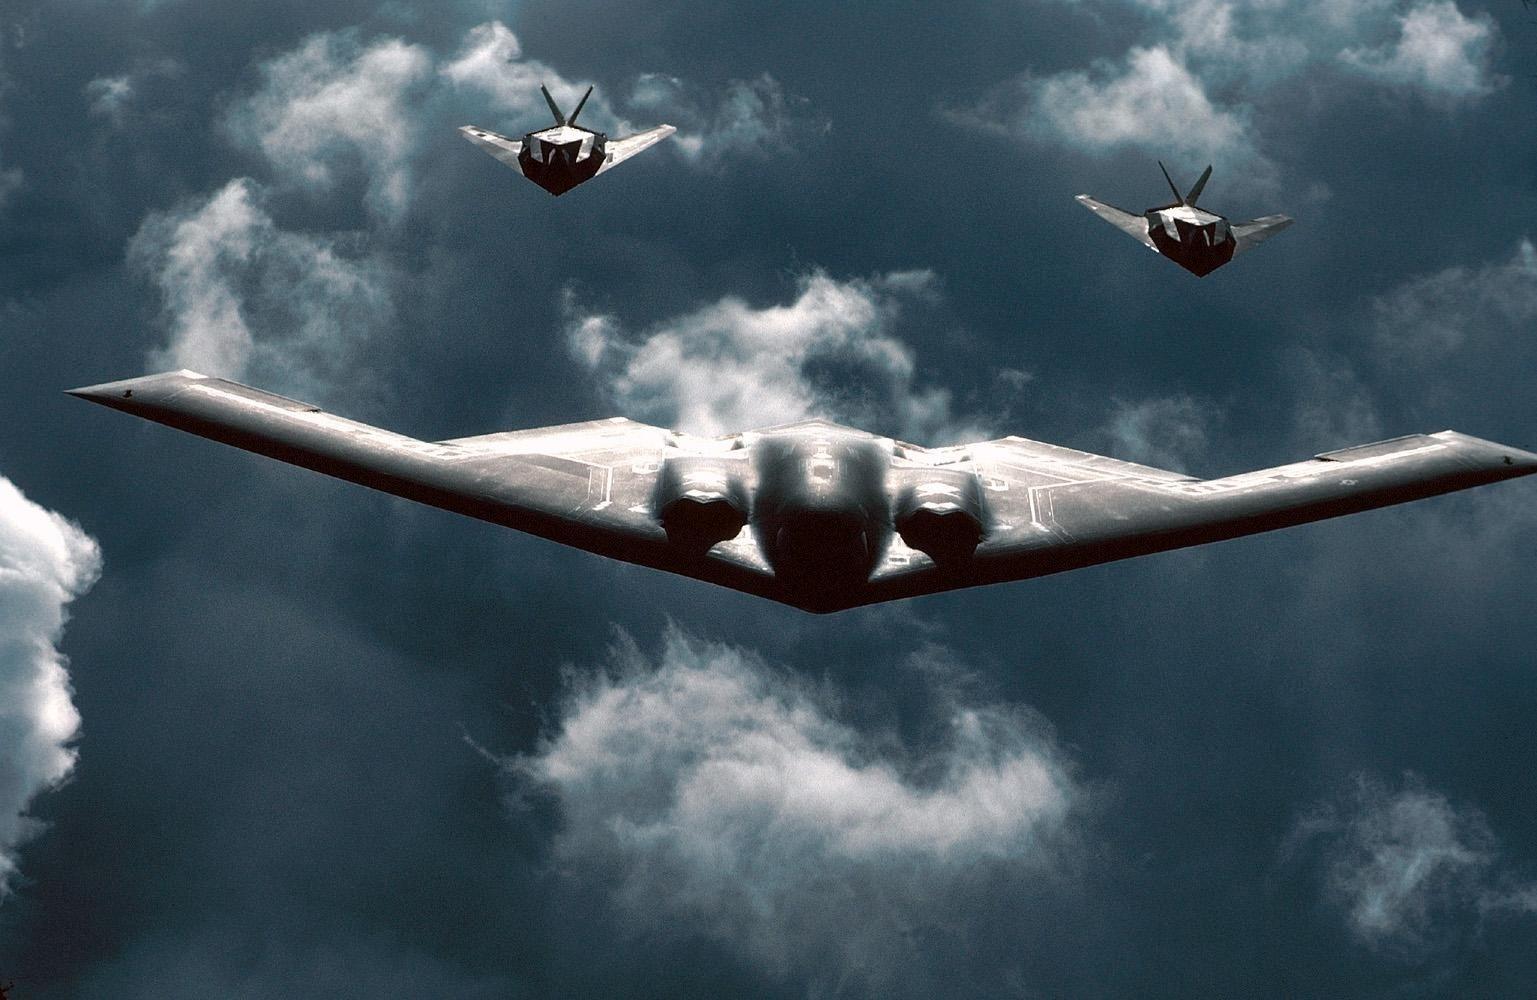 Northrop Grumman B 2 Spirit Wallpaper and Background Image 1537x1000